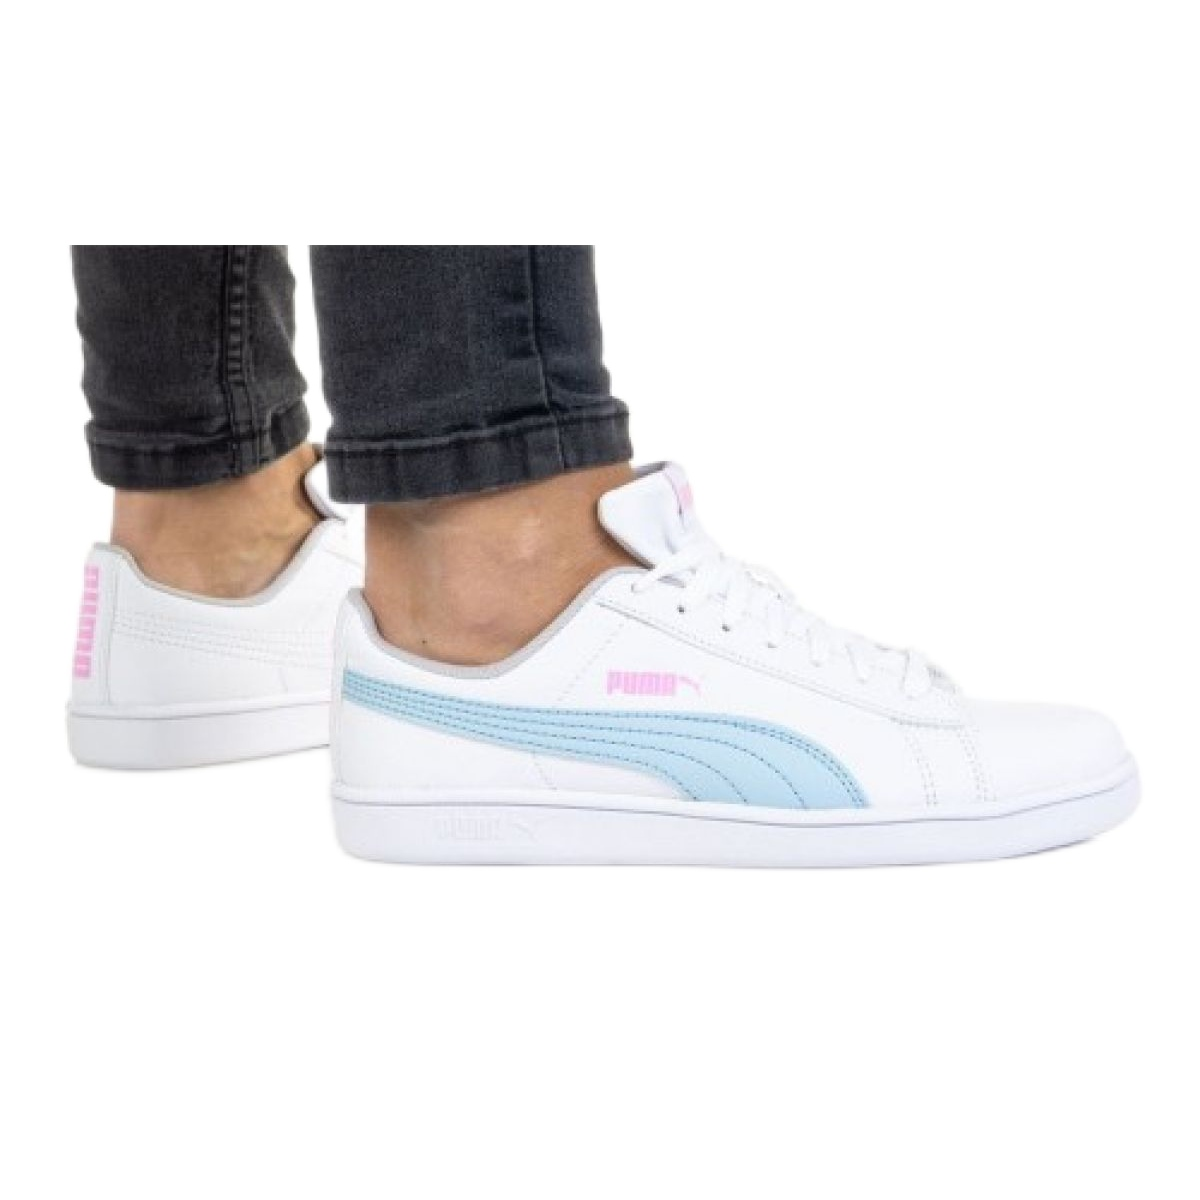 Puma Up Jr 373600 10 white